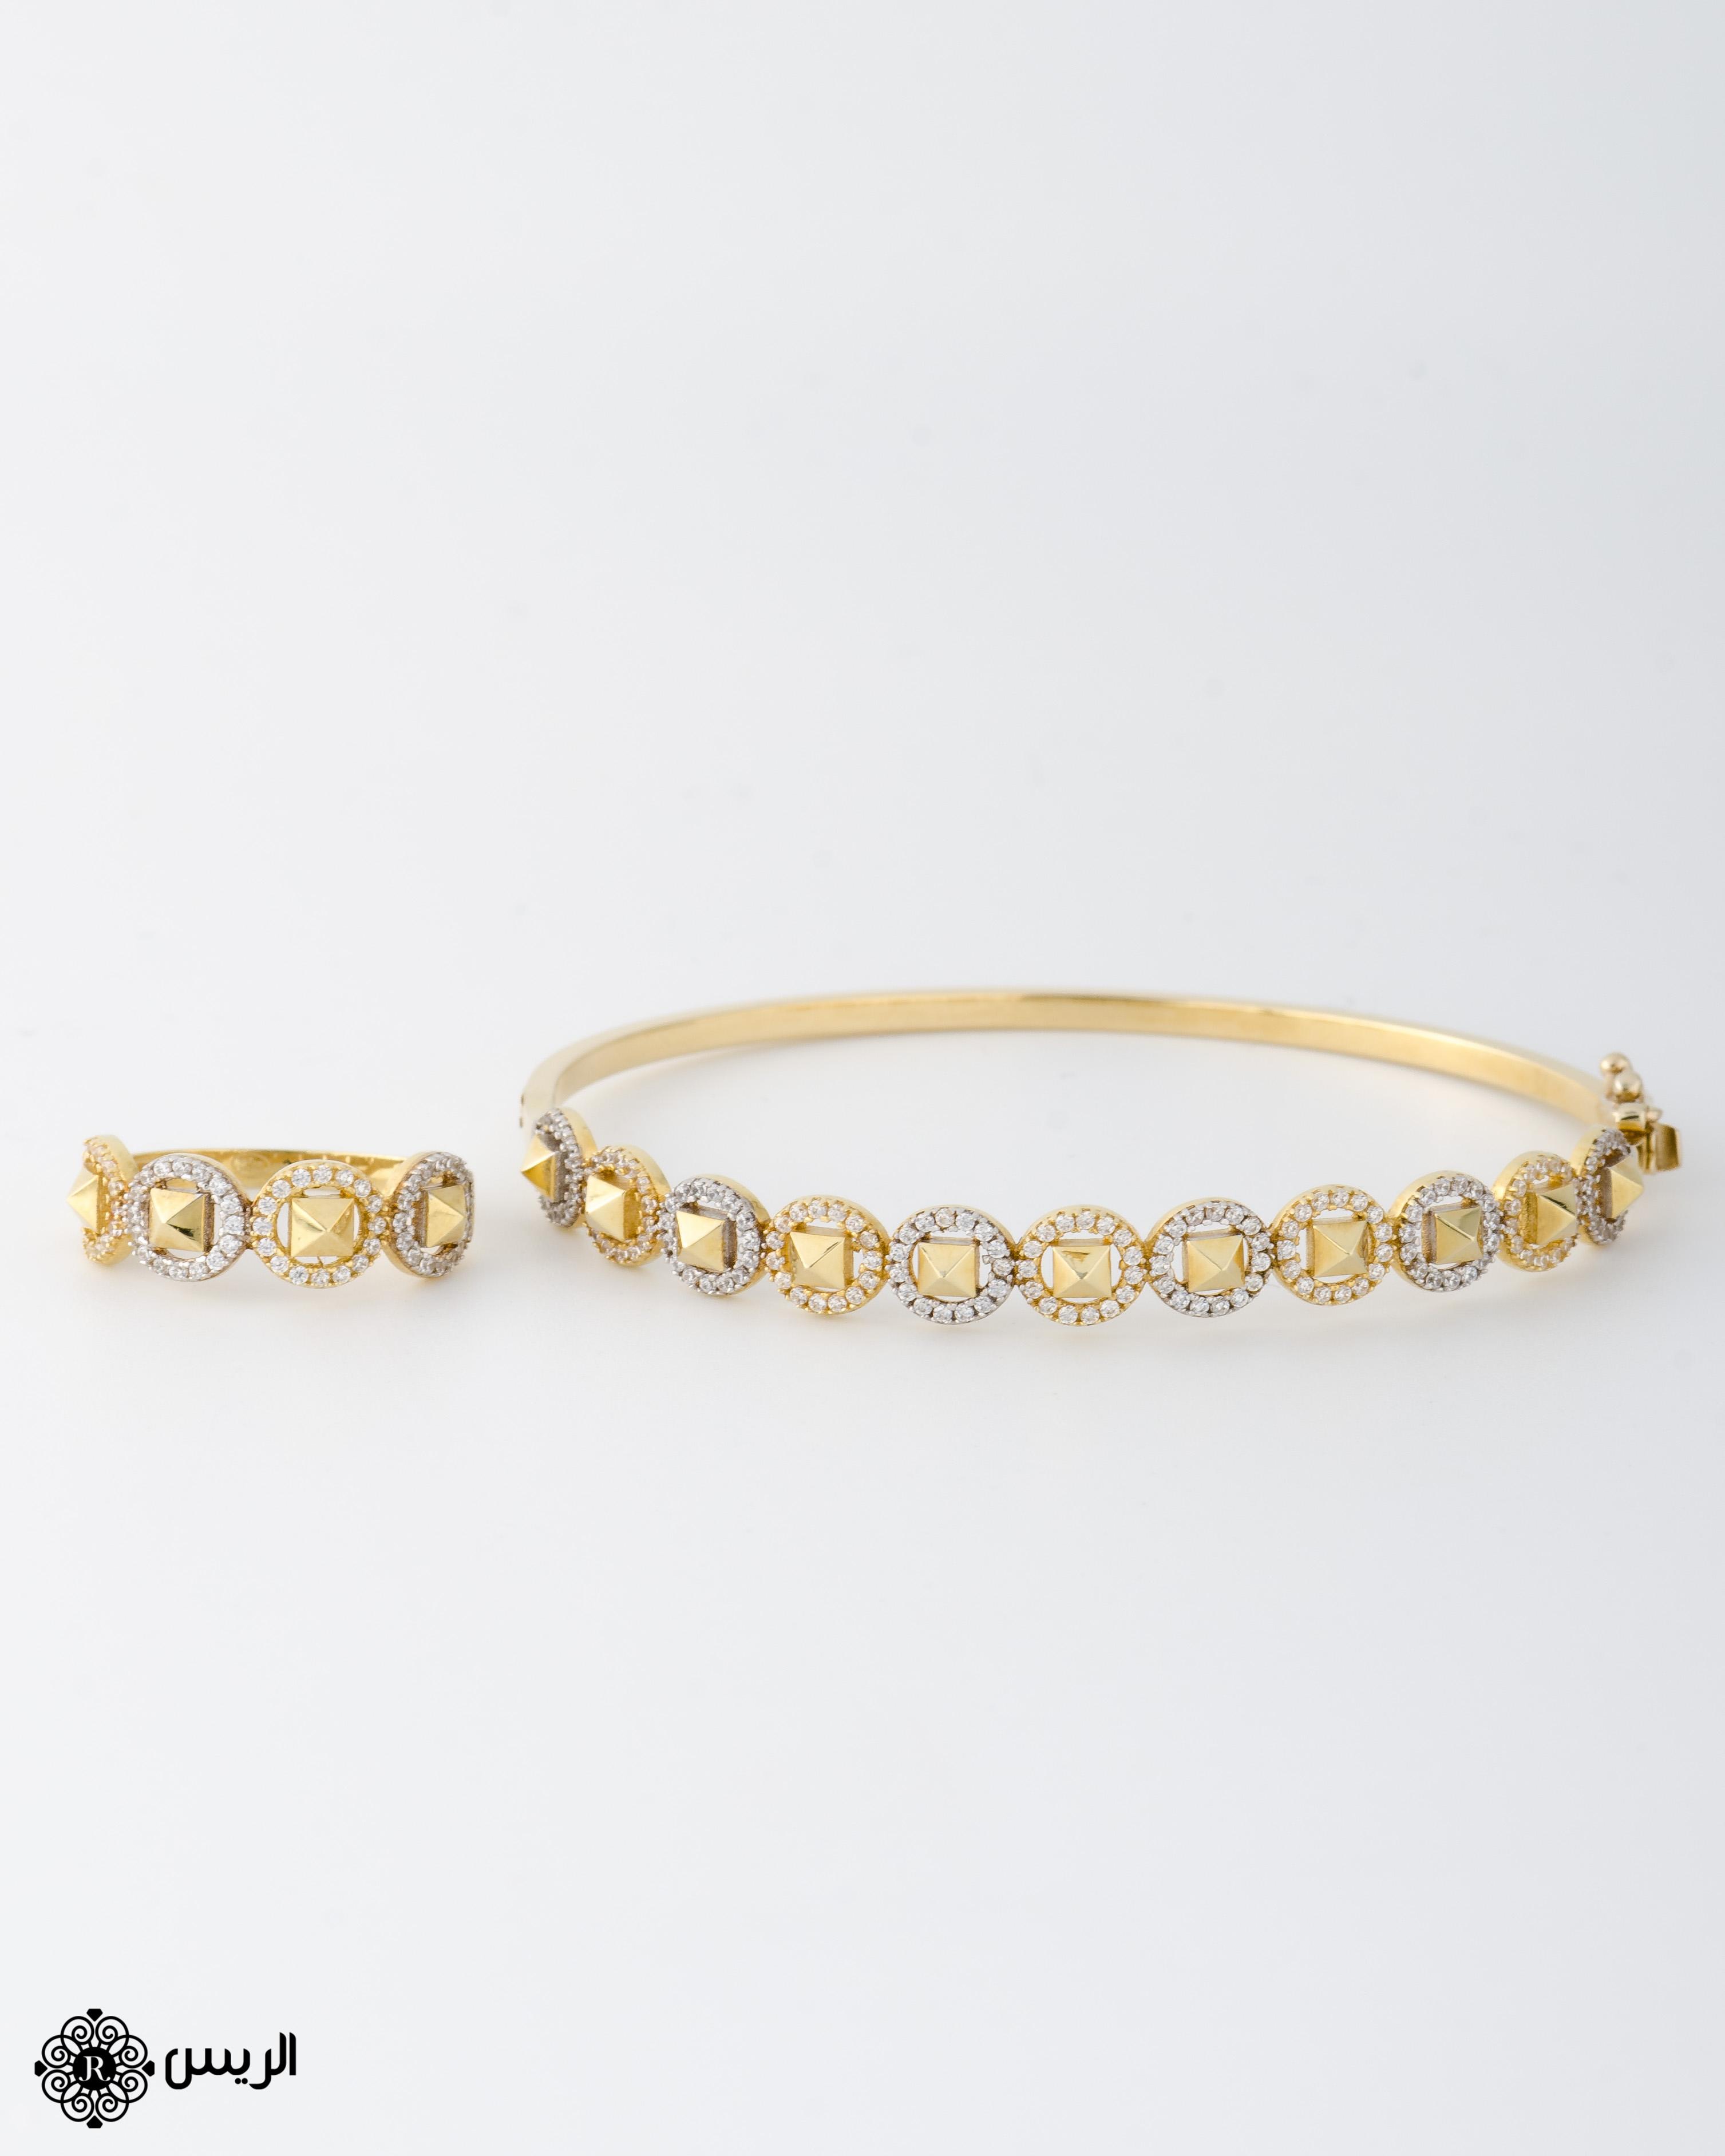 Raies jewelry Bangle with Ring Classic Design إسورة مع خاتم تصميم كلاسيكي الريس للمجوهرات